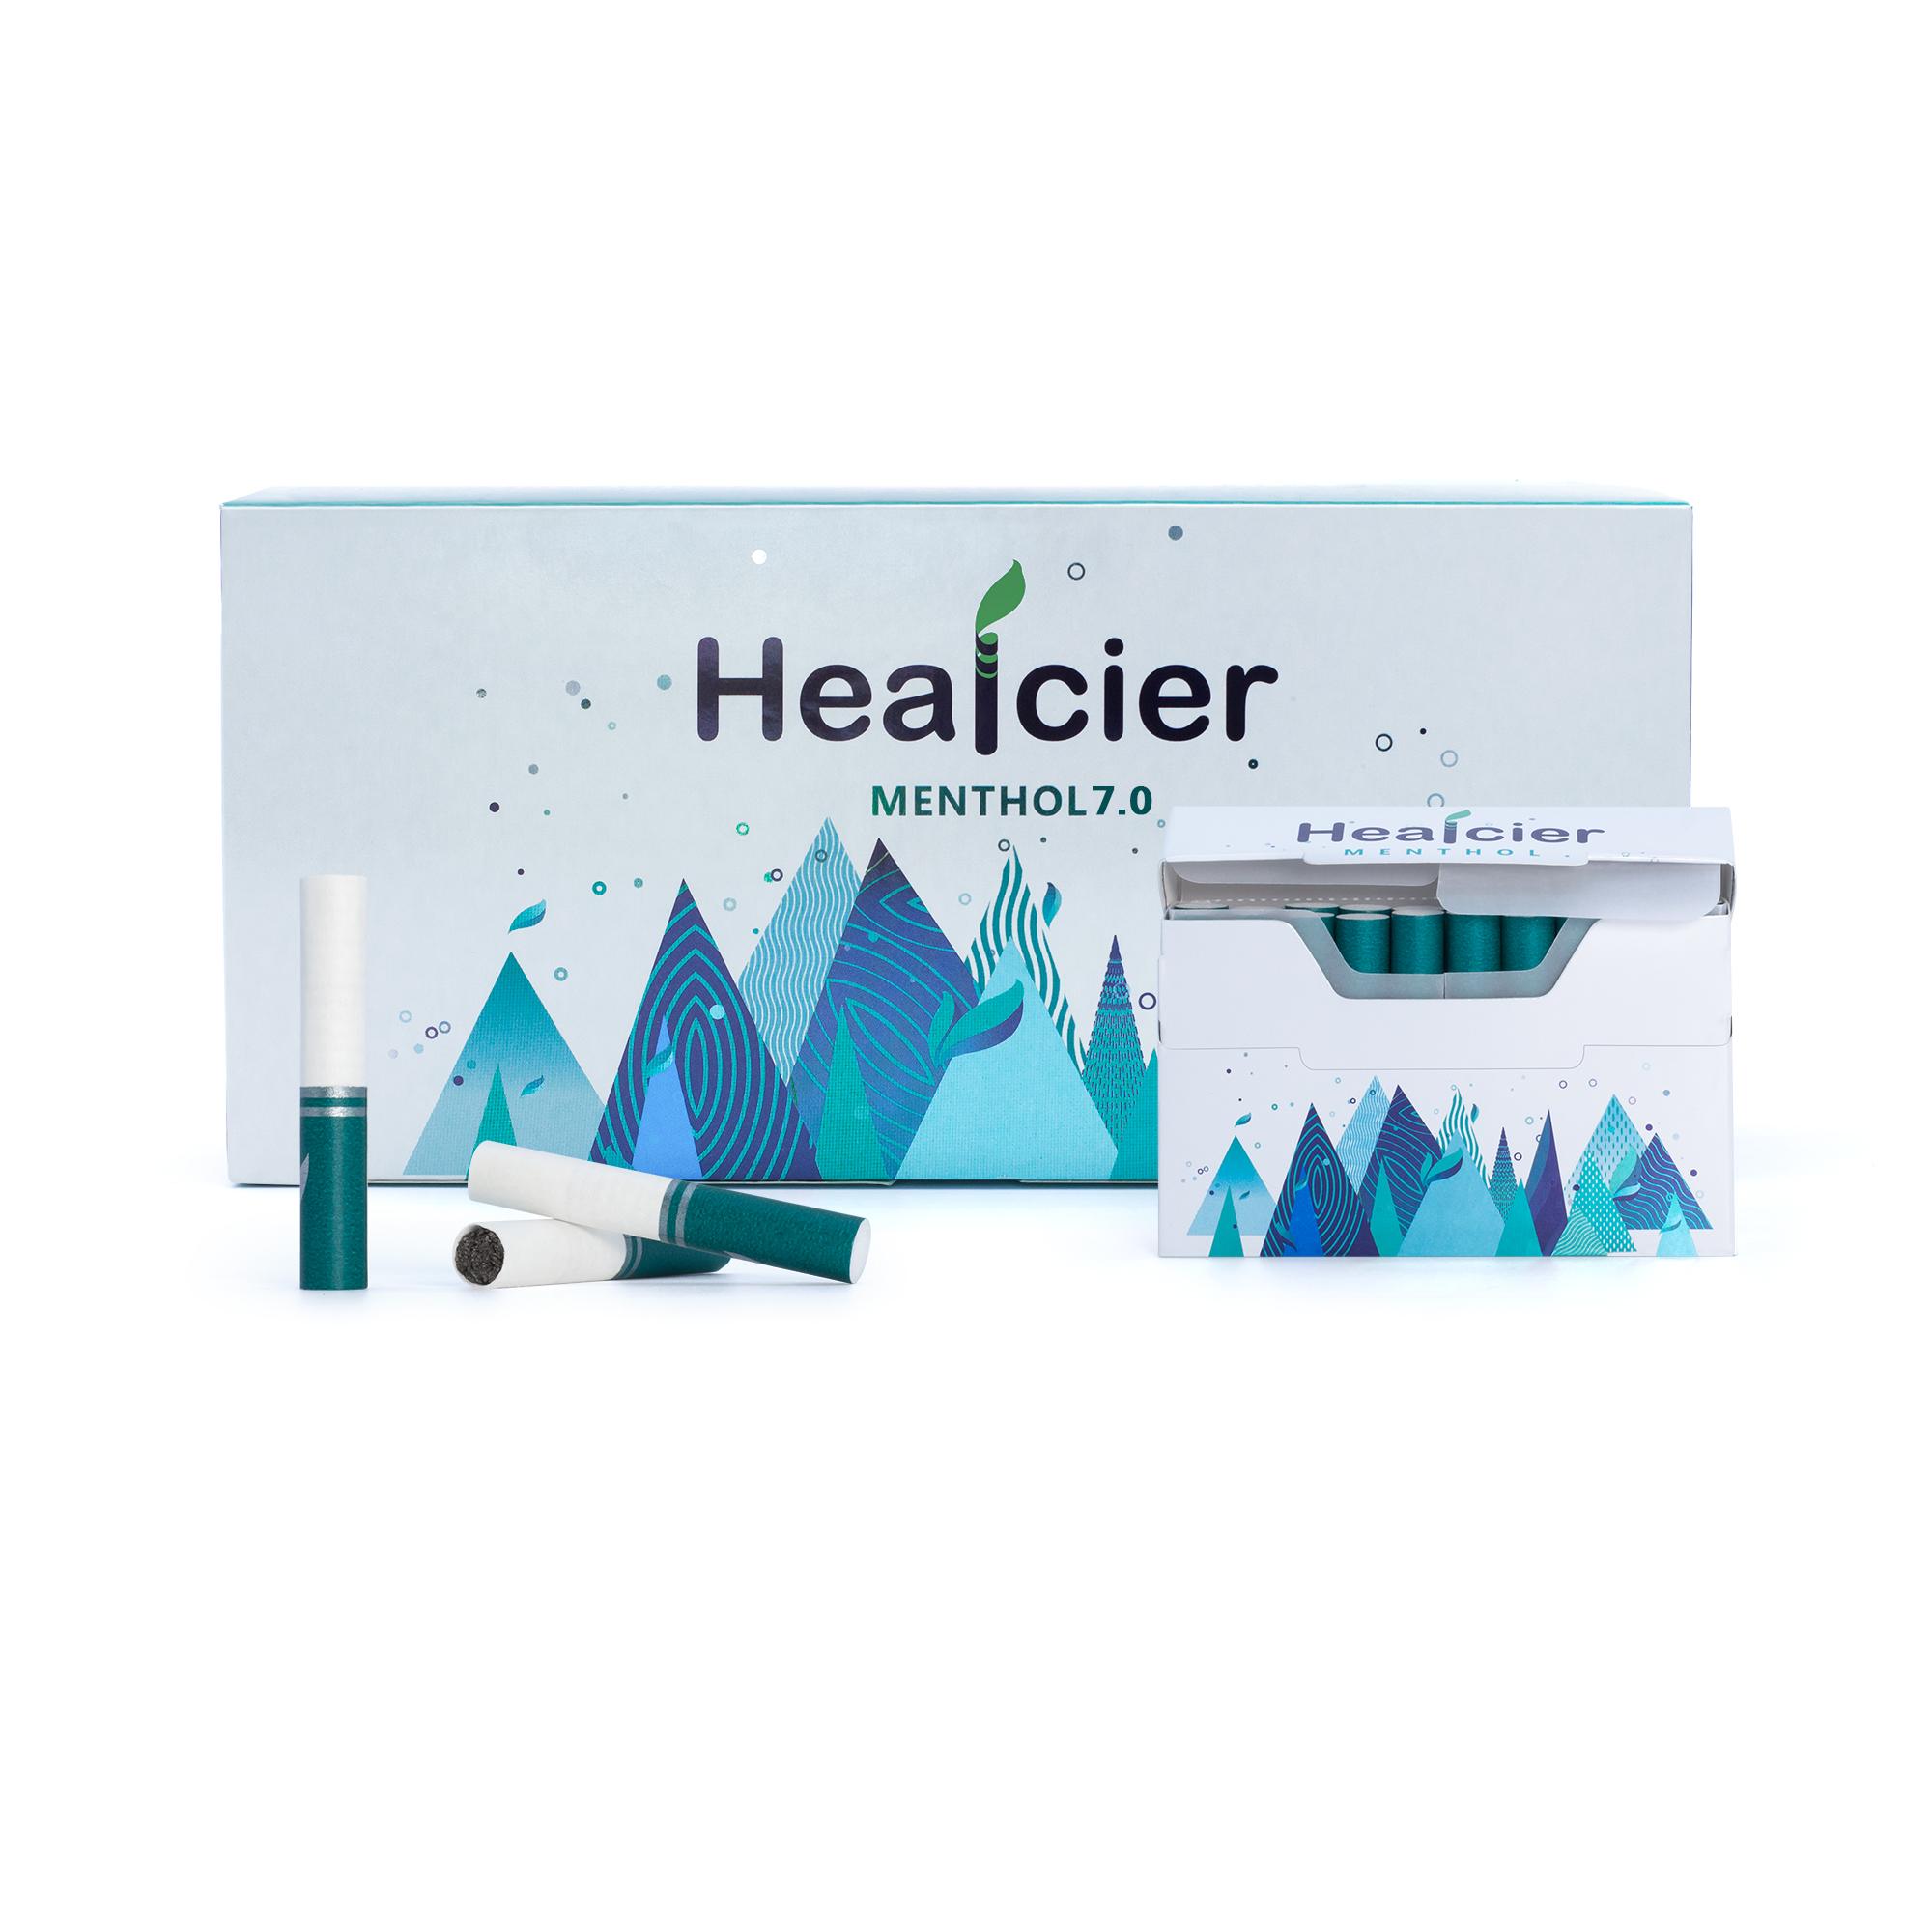 New Trending Tech Innovation Botanical Extracts Heating Not Burn Healcier Sticks - 4uTea | 4uTea.com